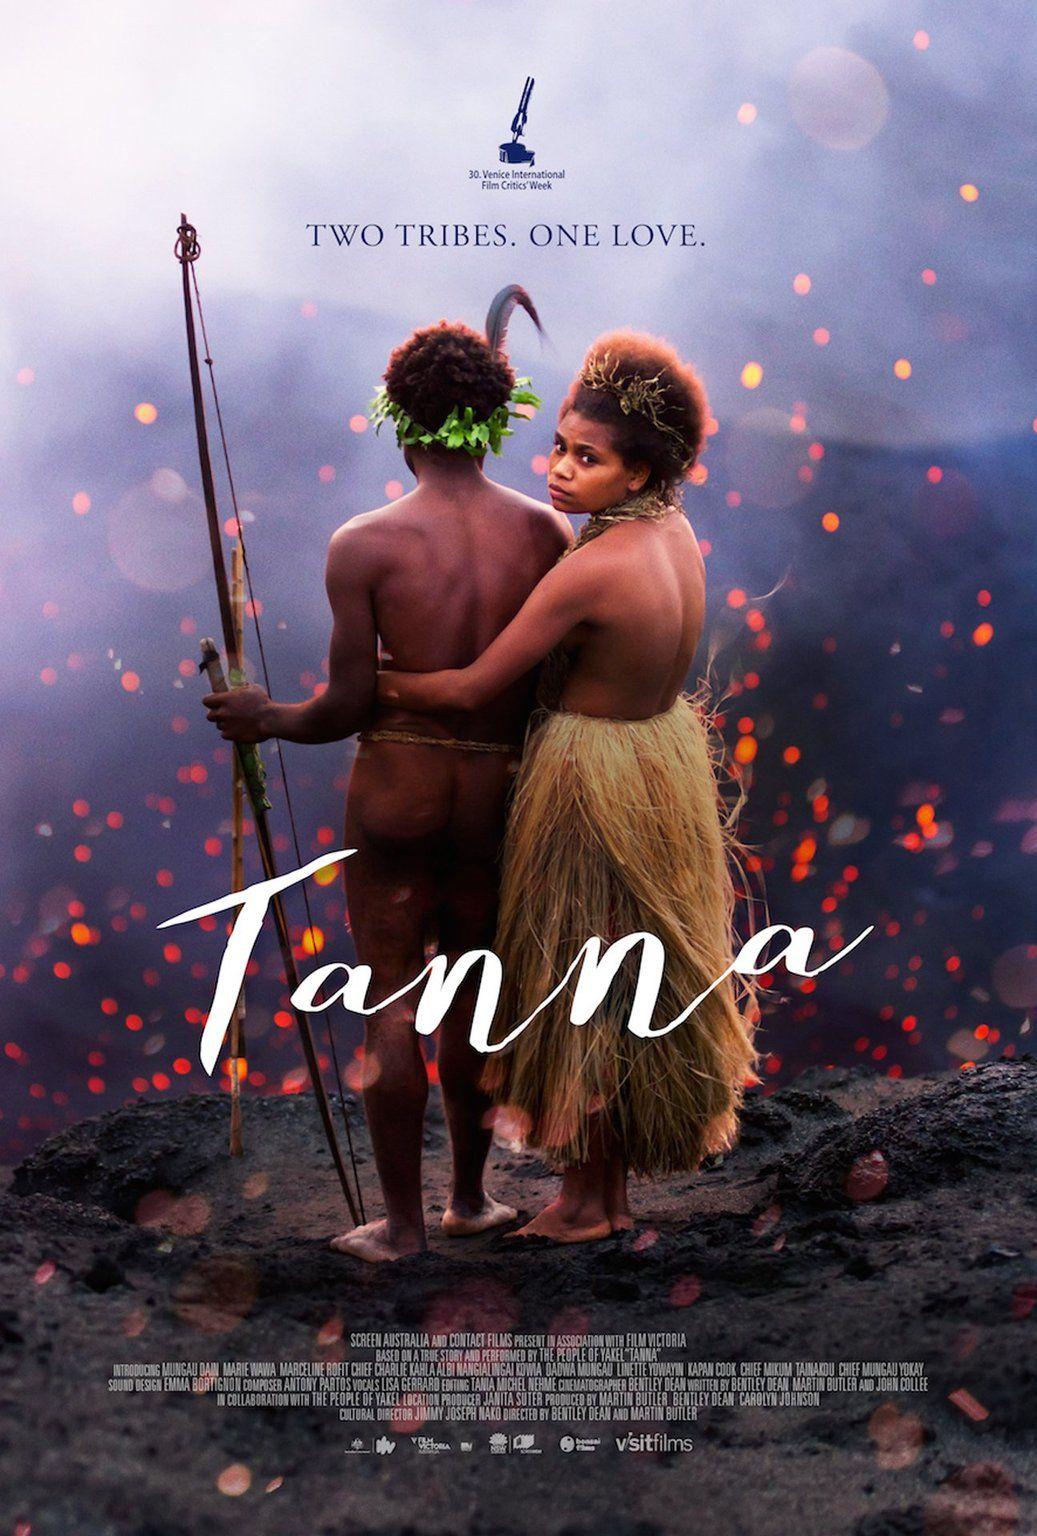 火山禁戀 (Tanna) Love fight, Movies online, Movies